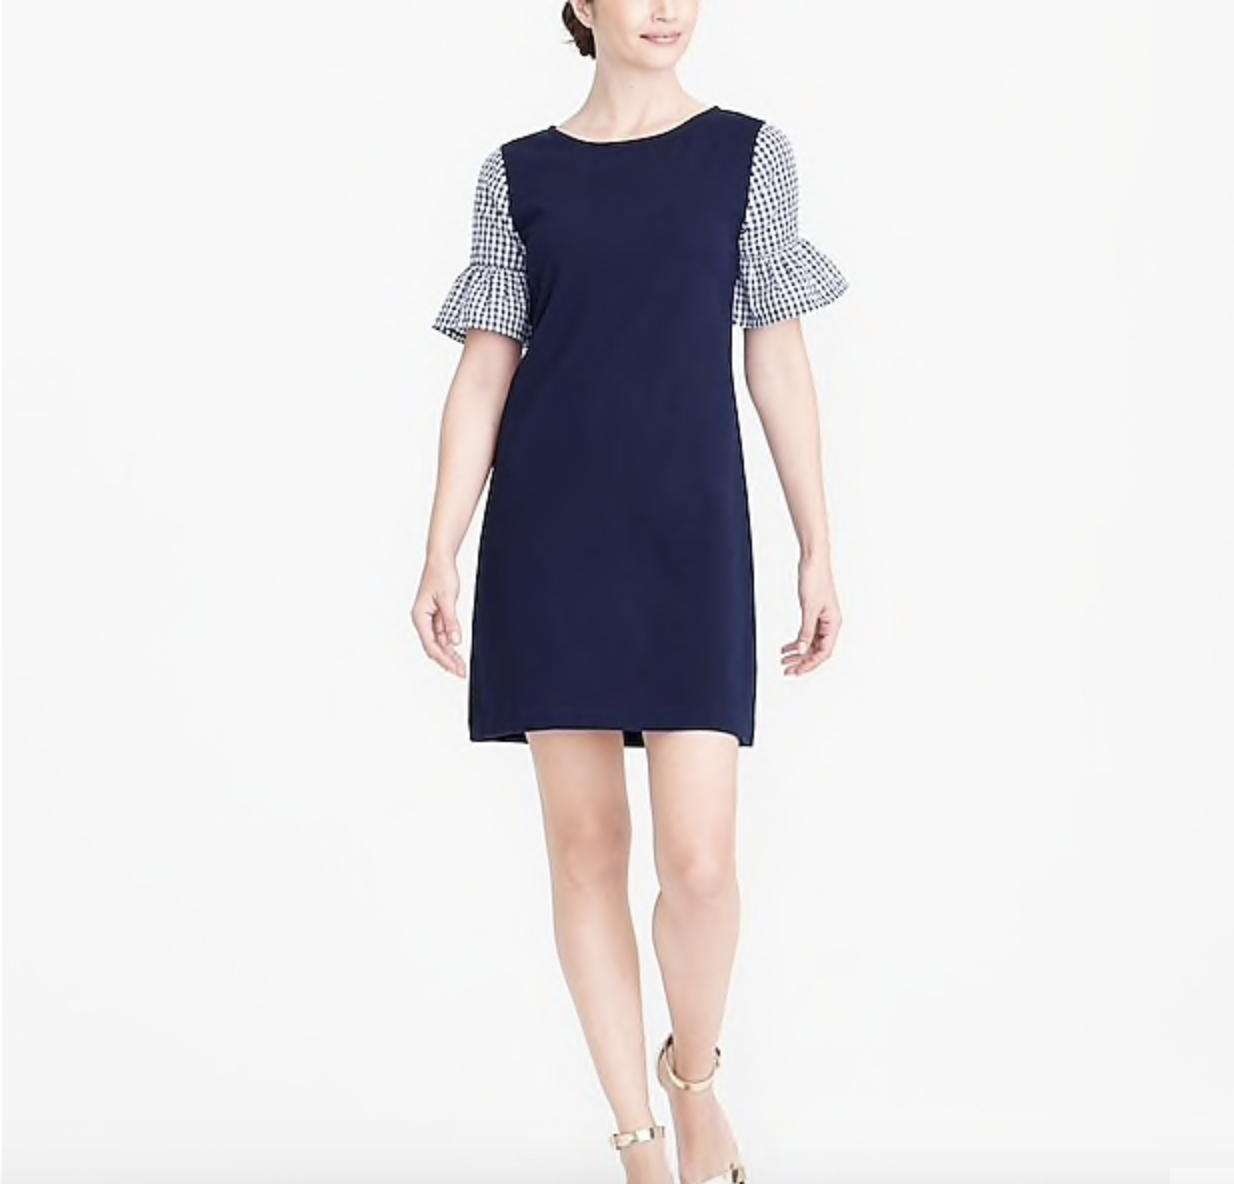 fashion deals gingham sleeved dress